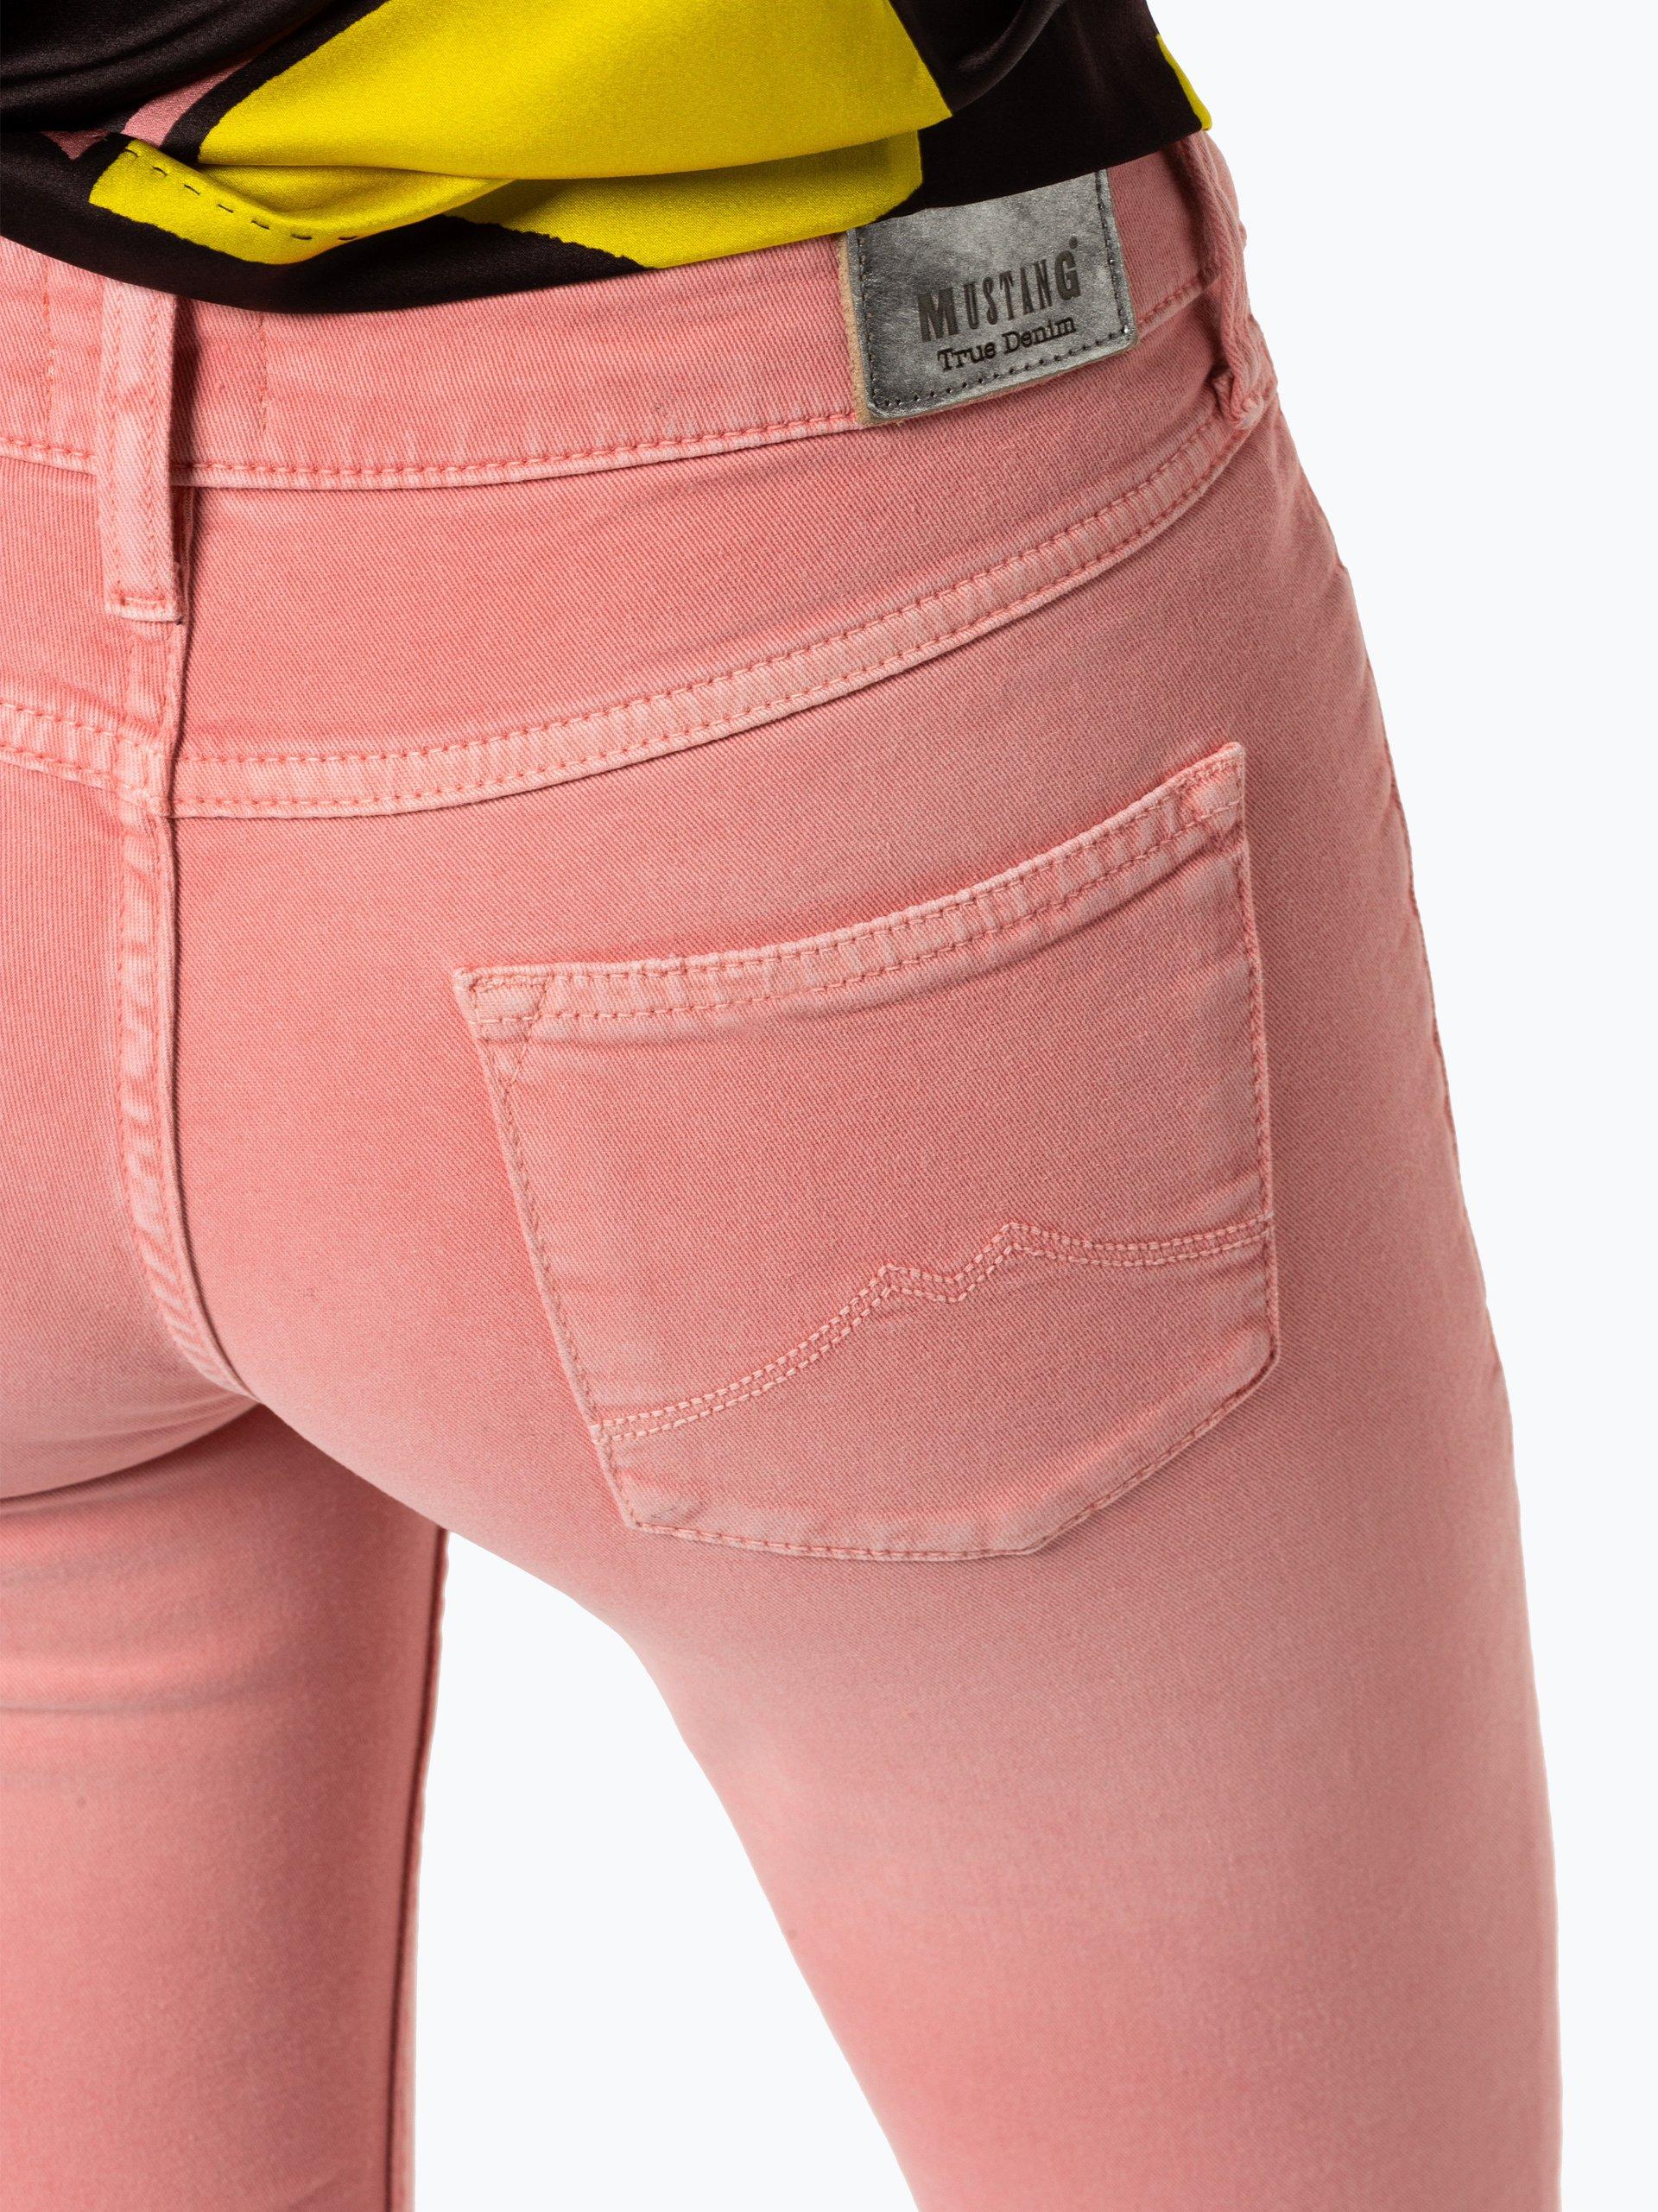 mustang damen jeans jasmin 7 8 online kaufen peek und. Black Bedroom Furniture Sets. Home Design Ideas